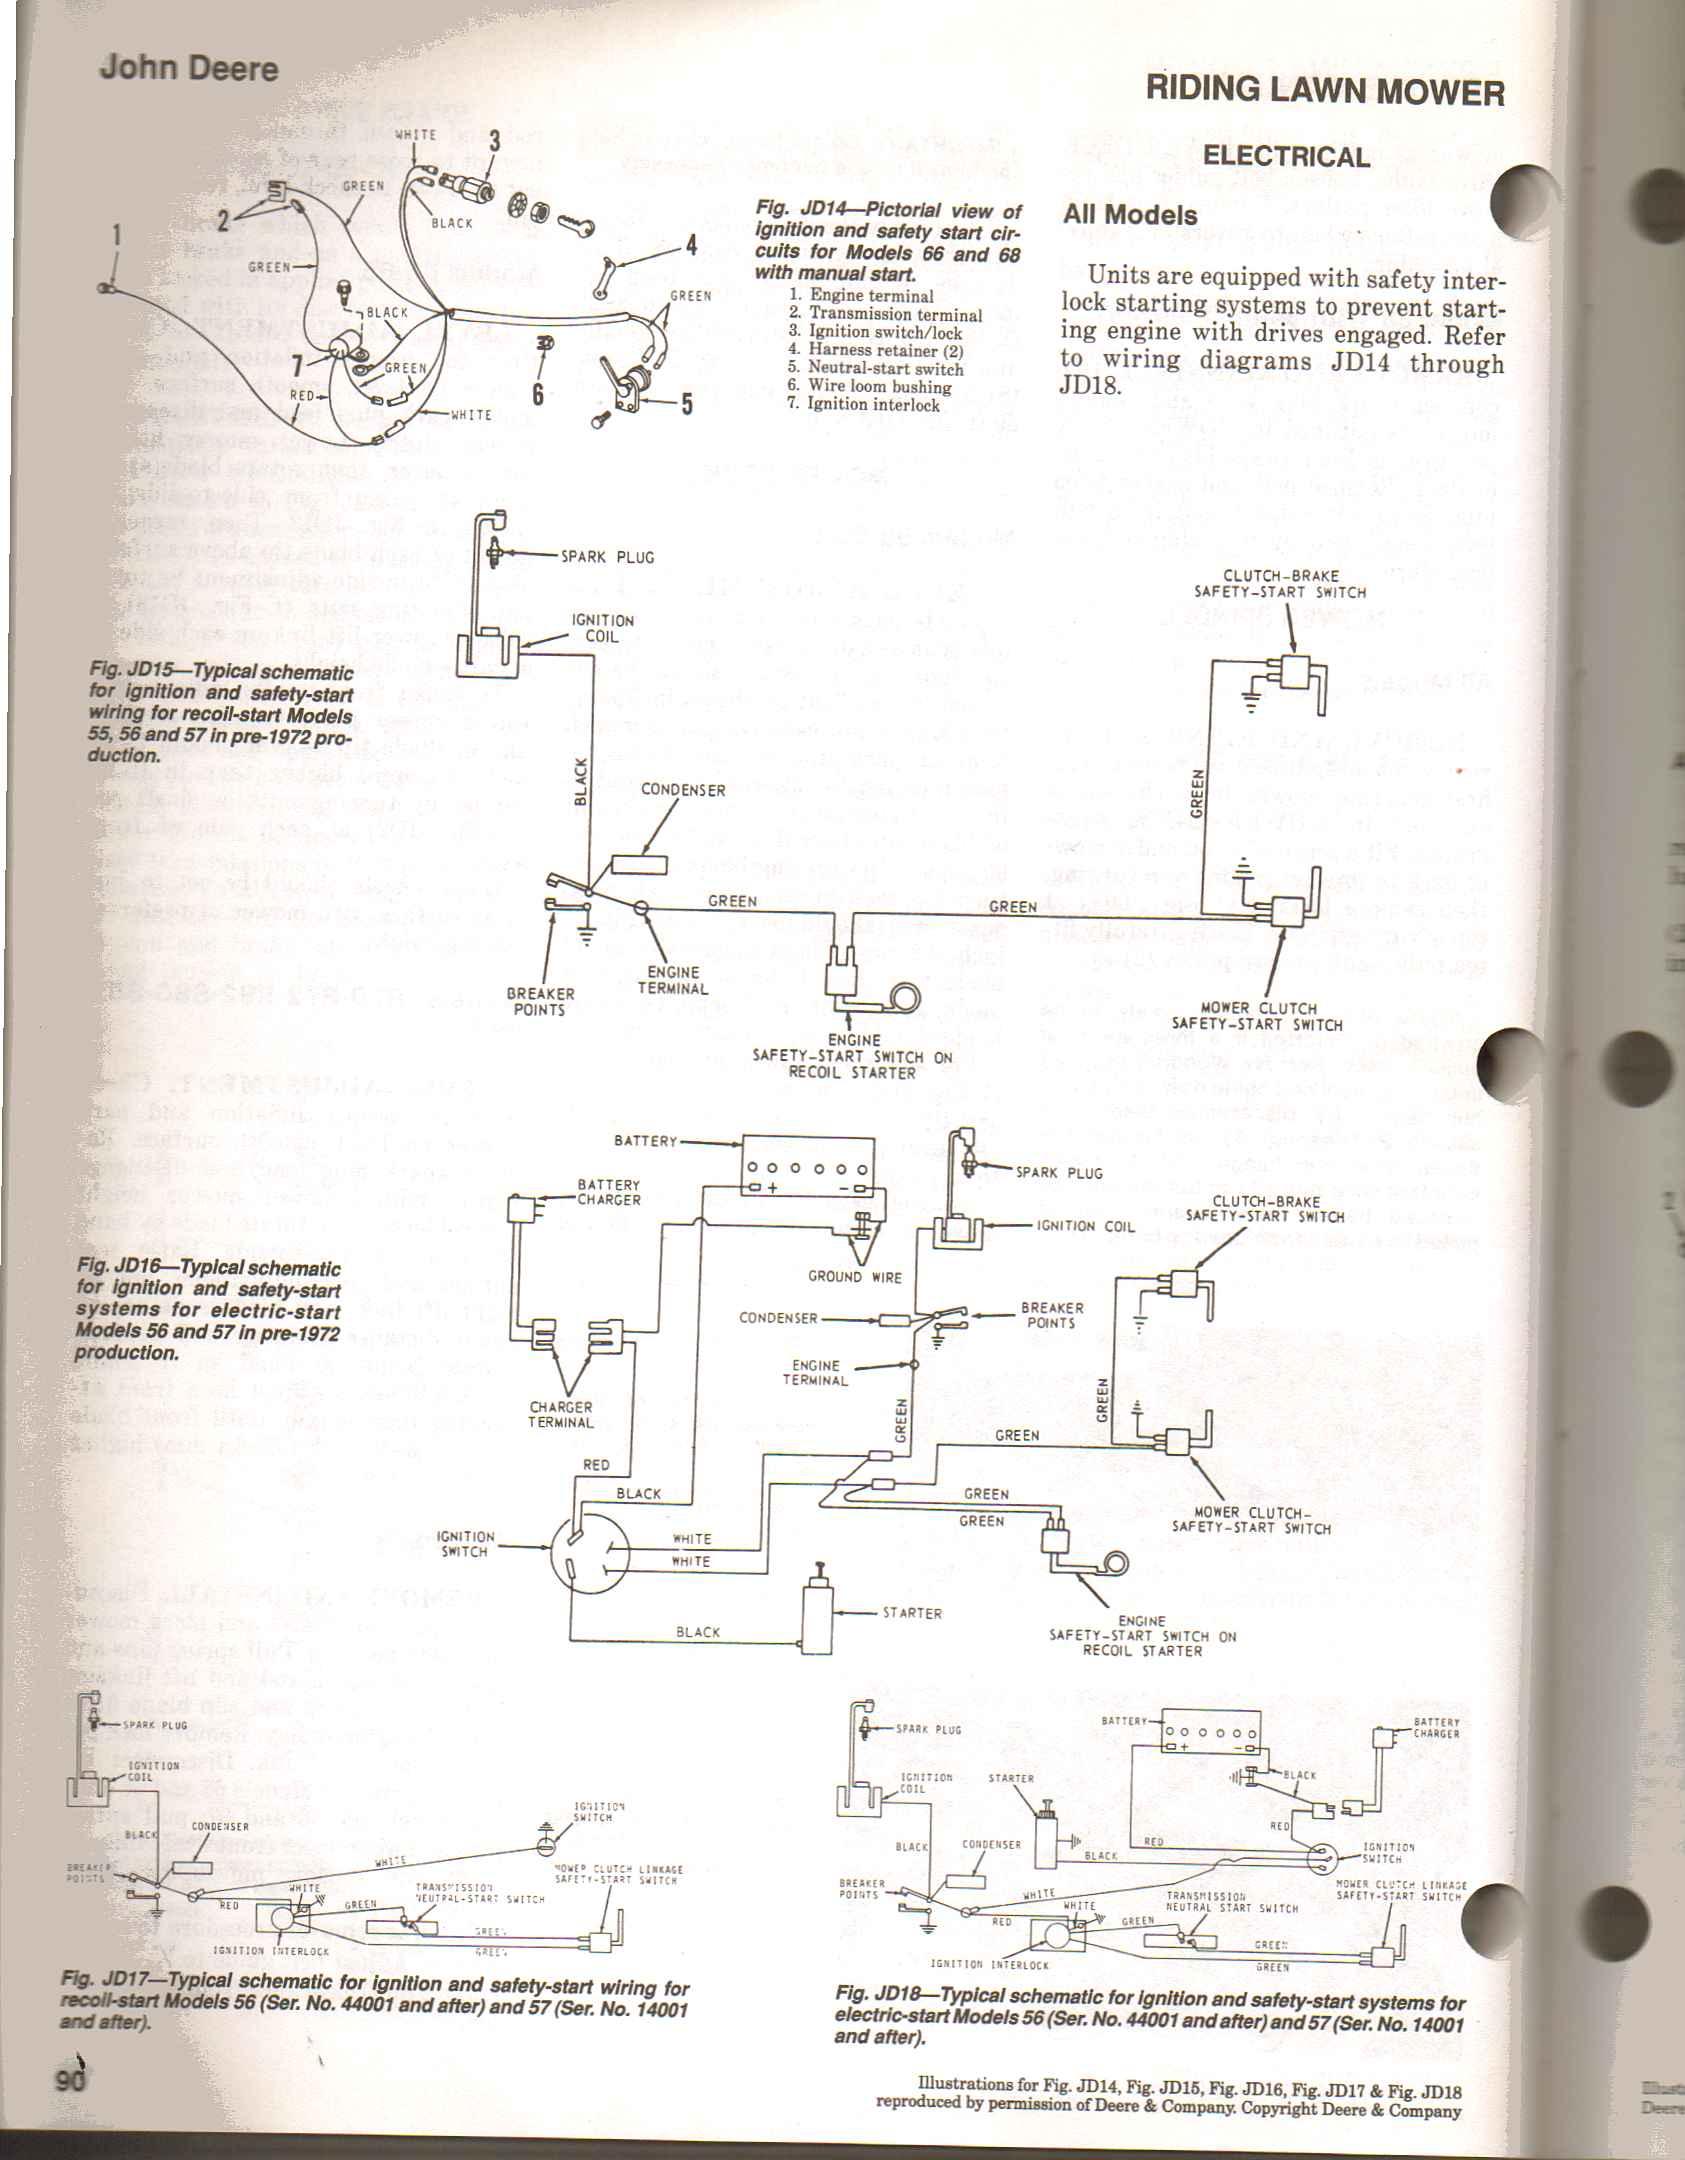 hight resolution of john deere 5103 wiring diagram john deere 4320 wiring diagram john deere 790 wiring